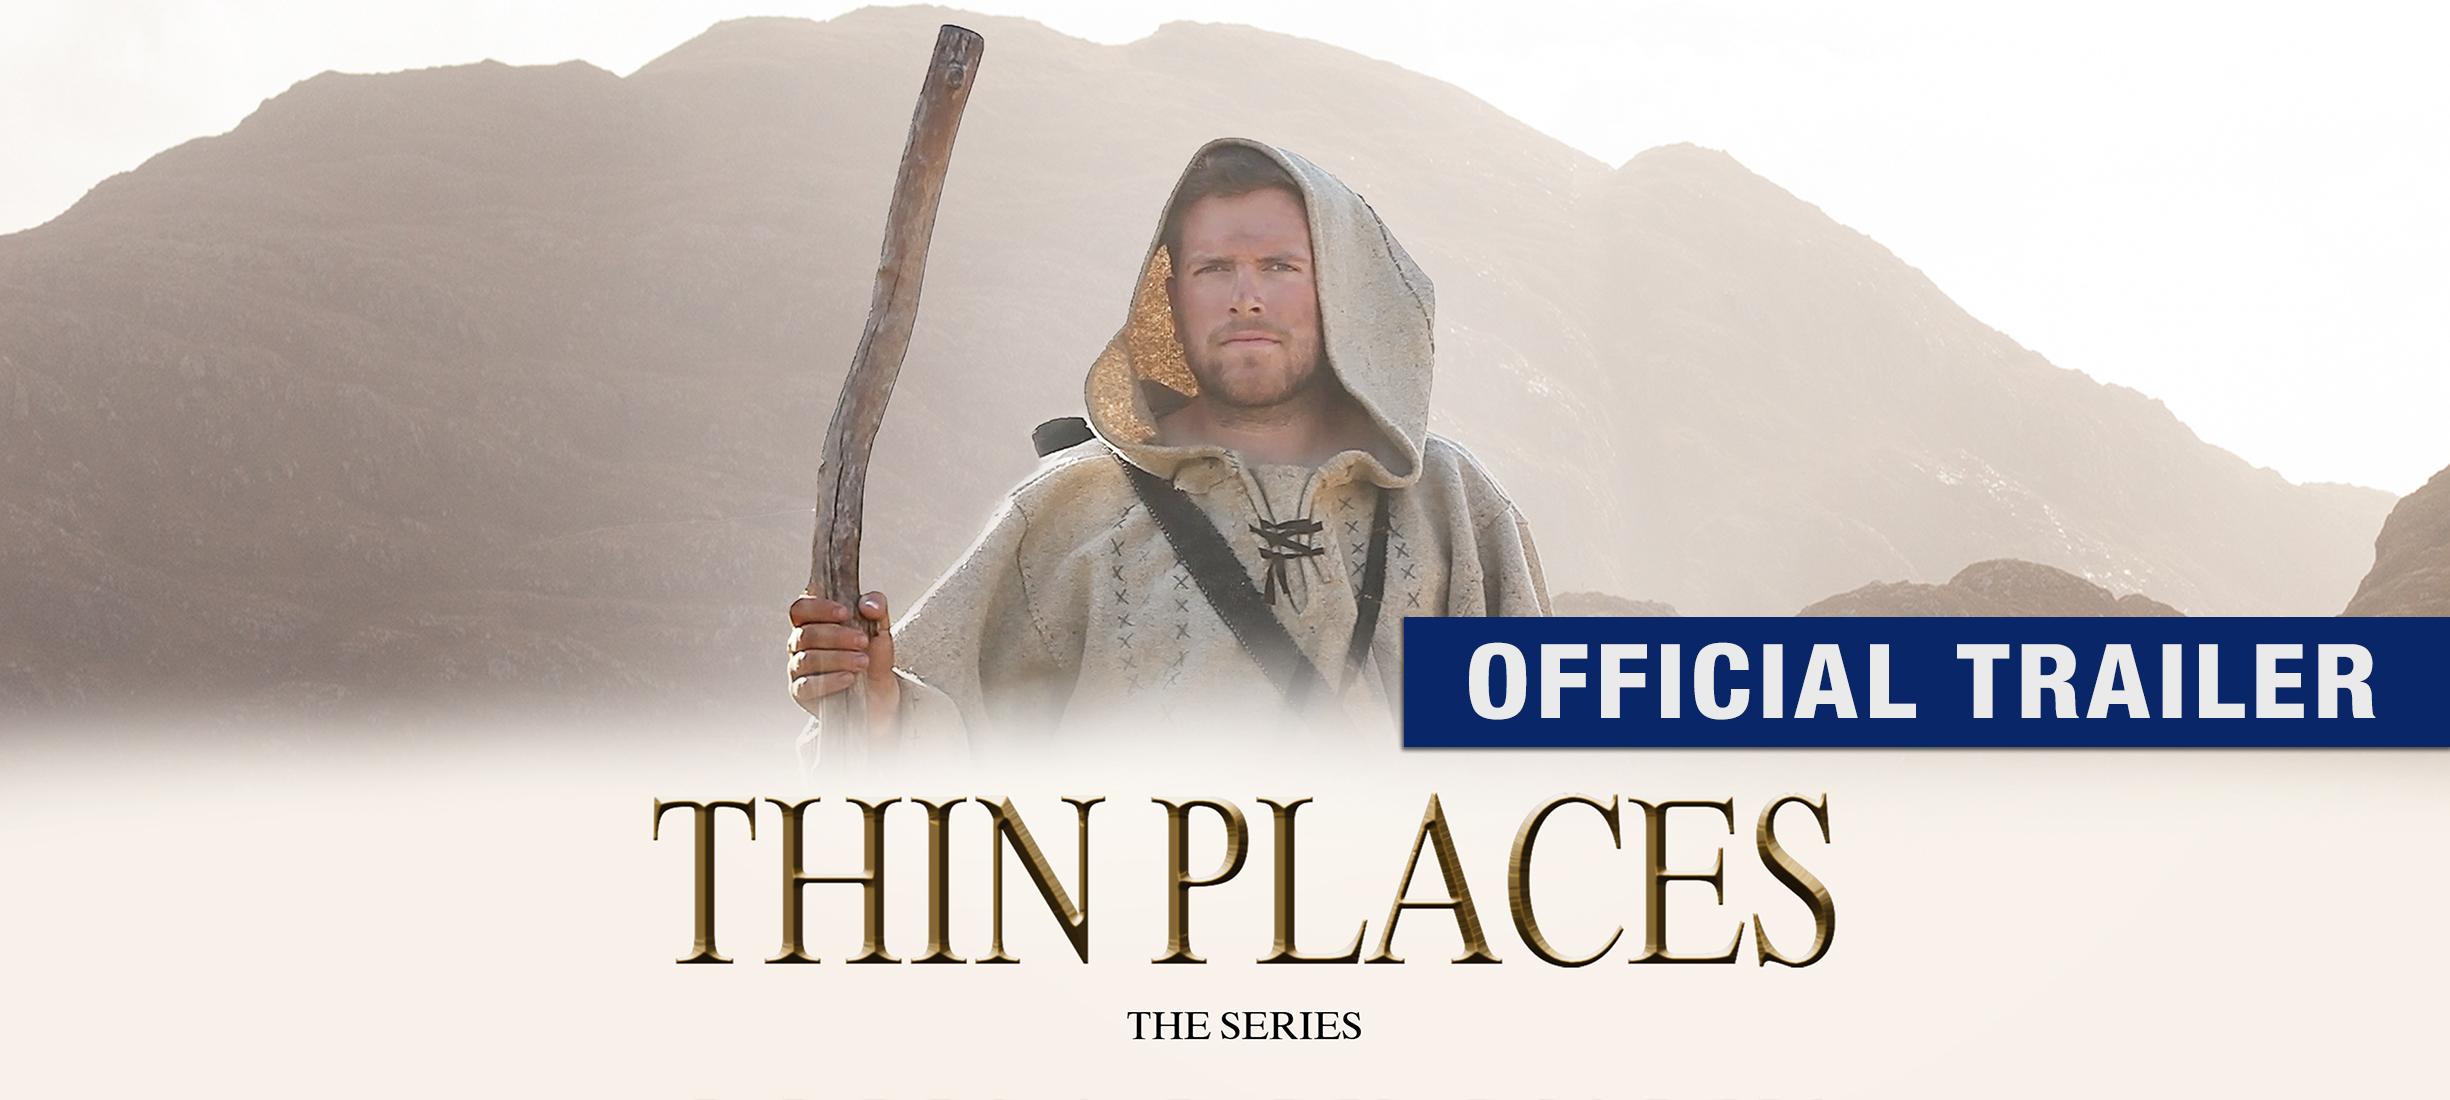 Thin Places: a Journey through Celtic Faith: Trailer